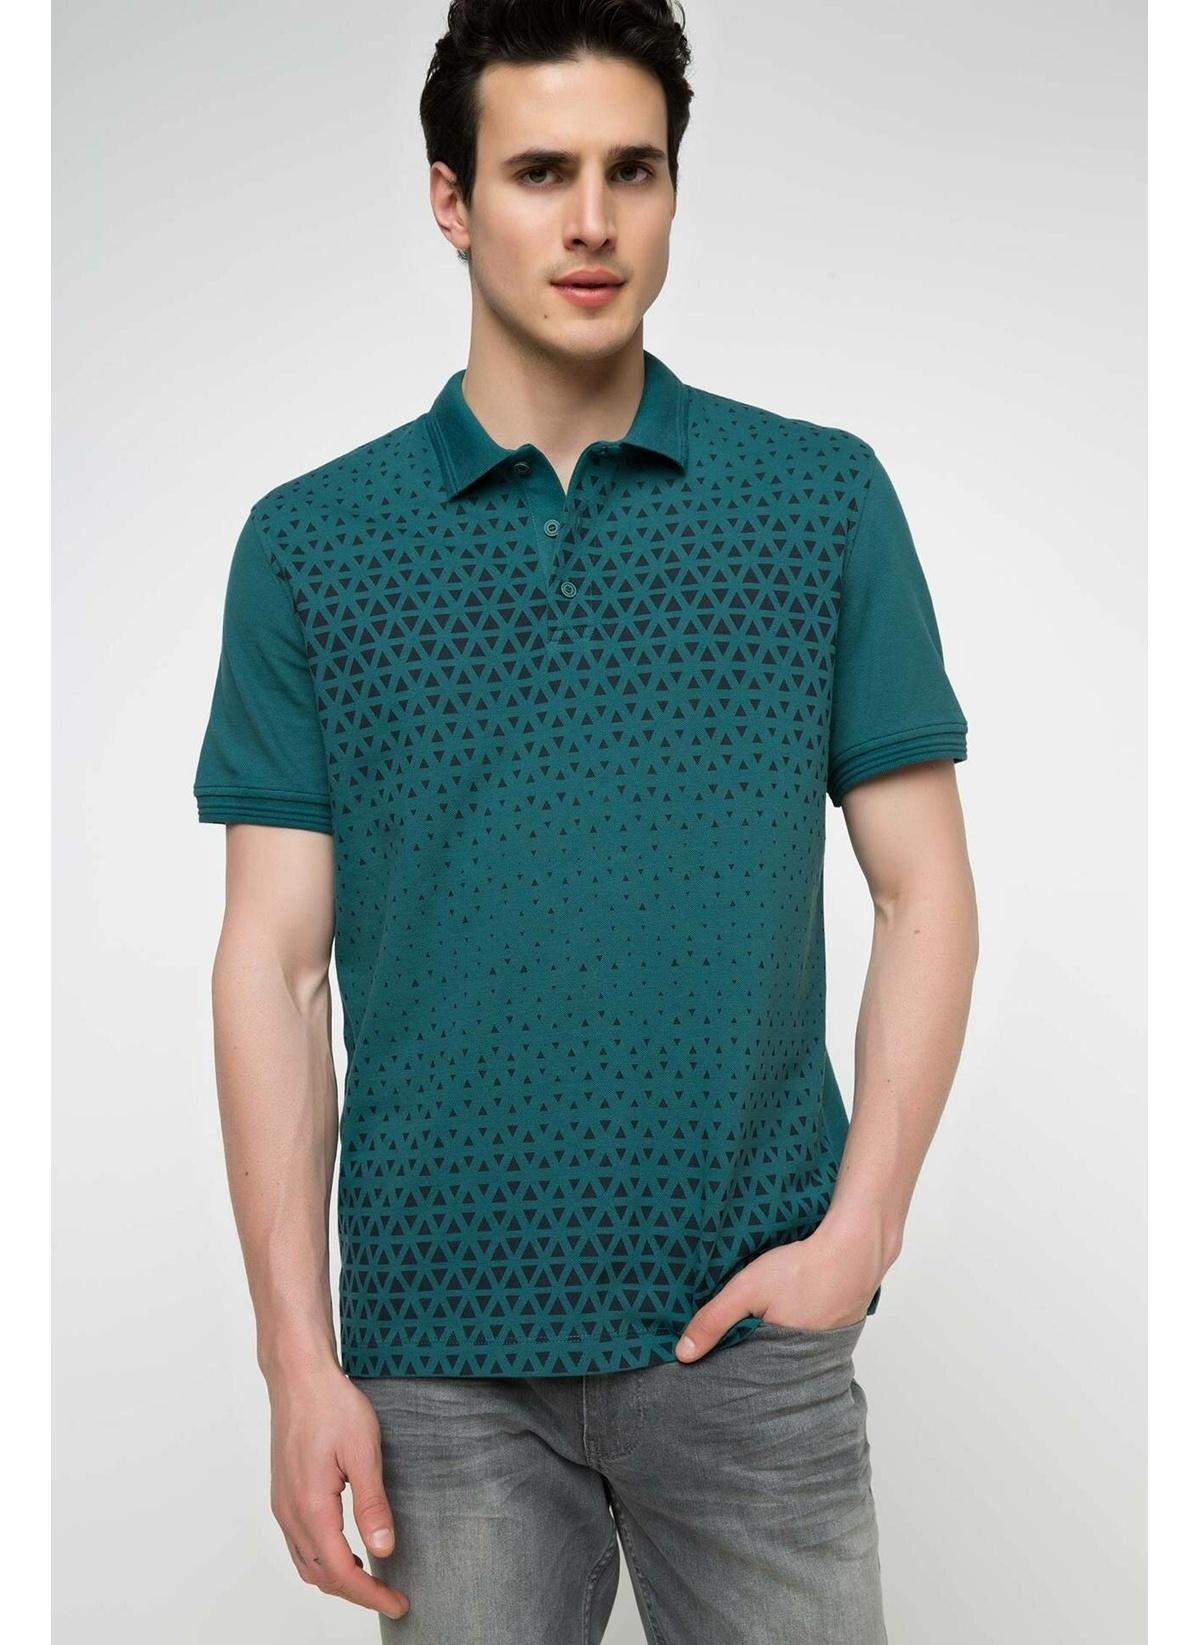 Defacto Tişört G9897az17smgn406t-shirt – 29.99 TL